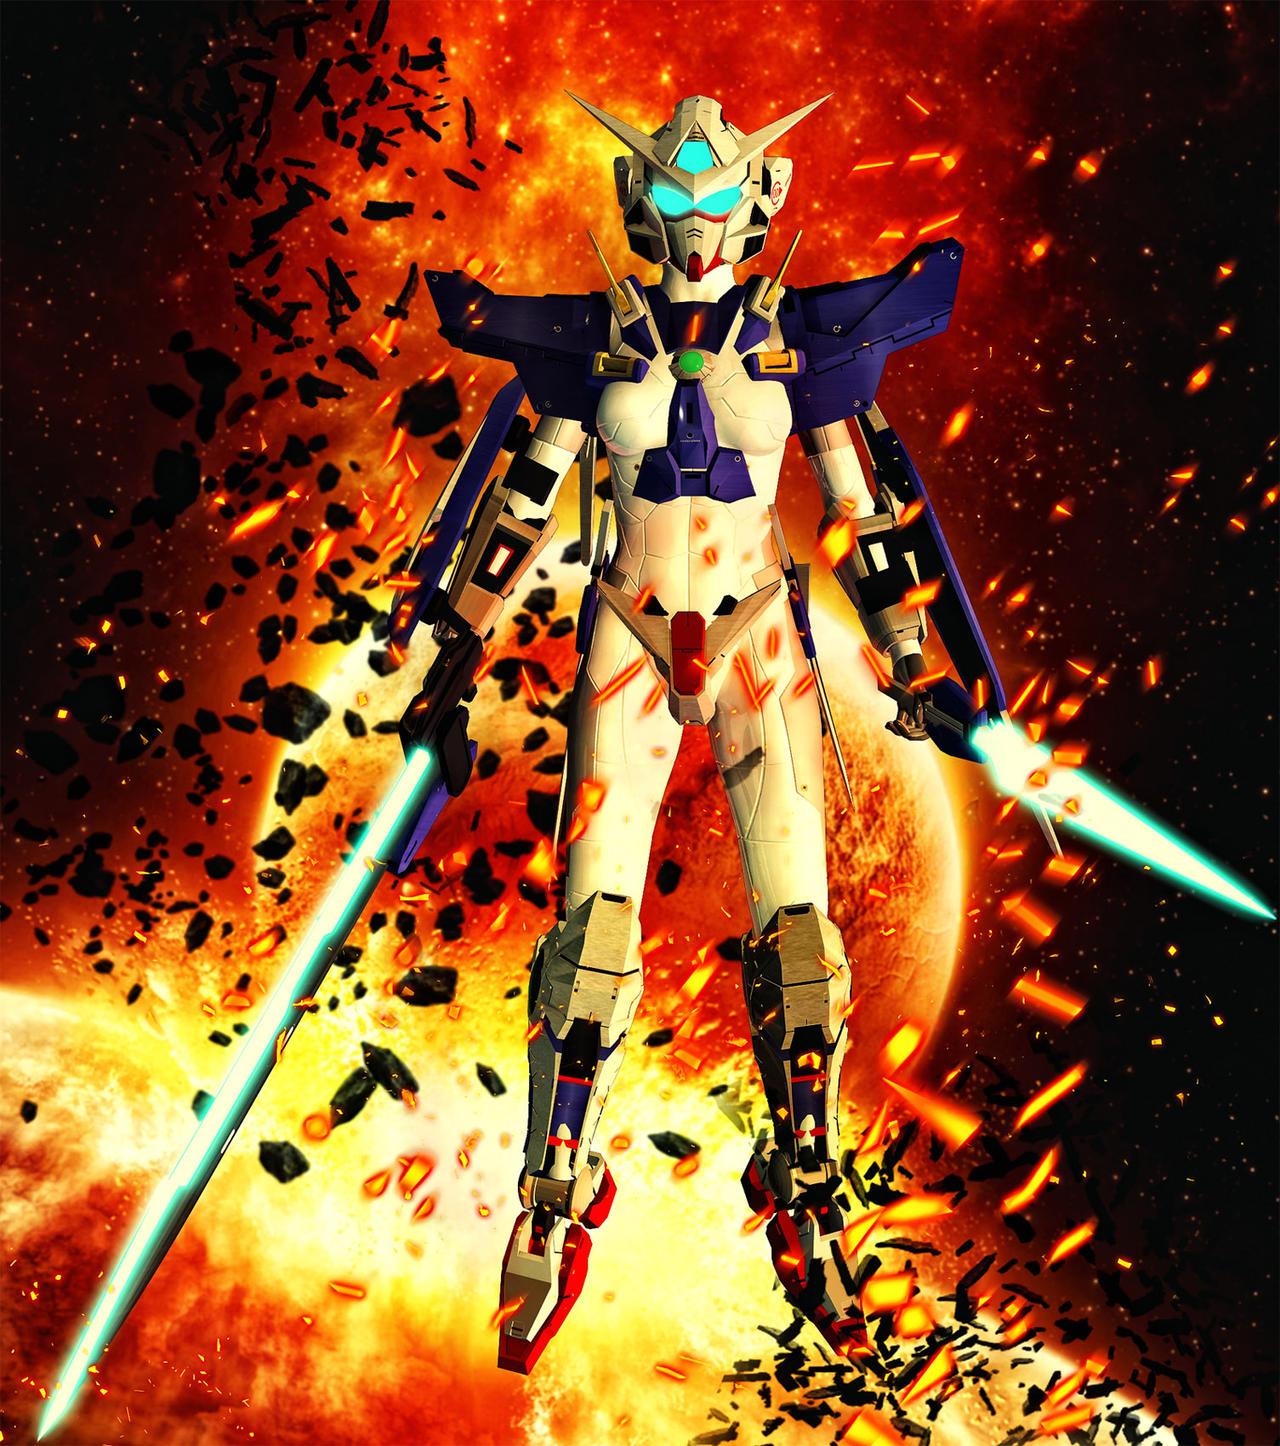 Exia Gundam Archclan EvilEliot